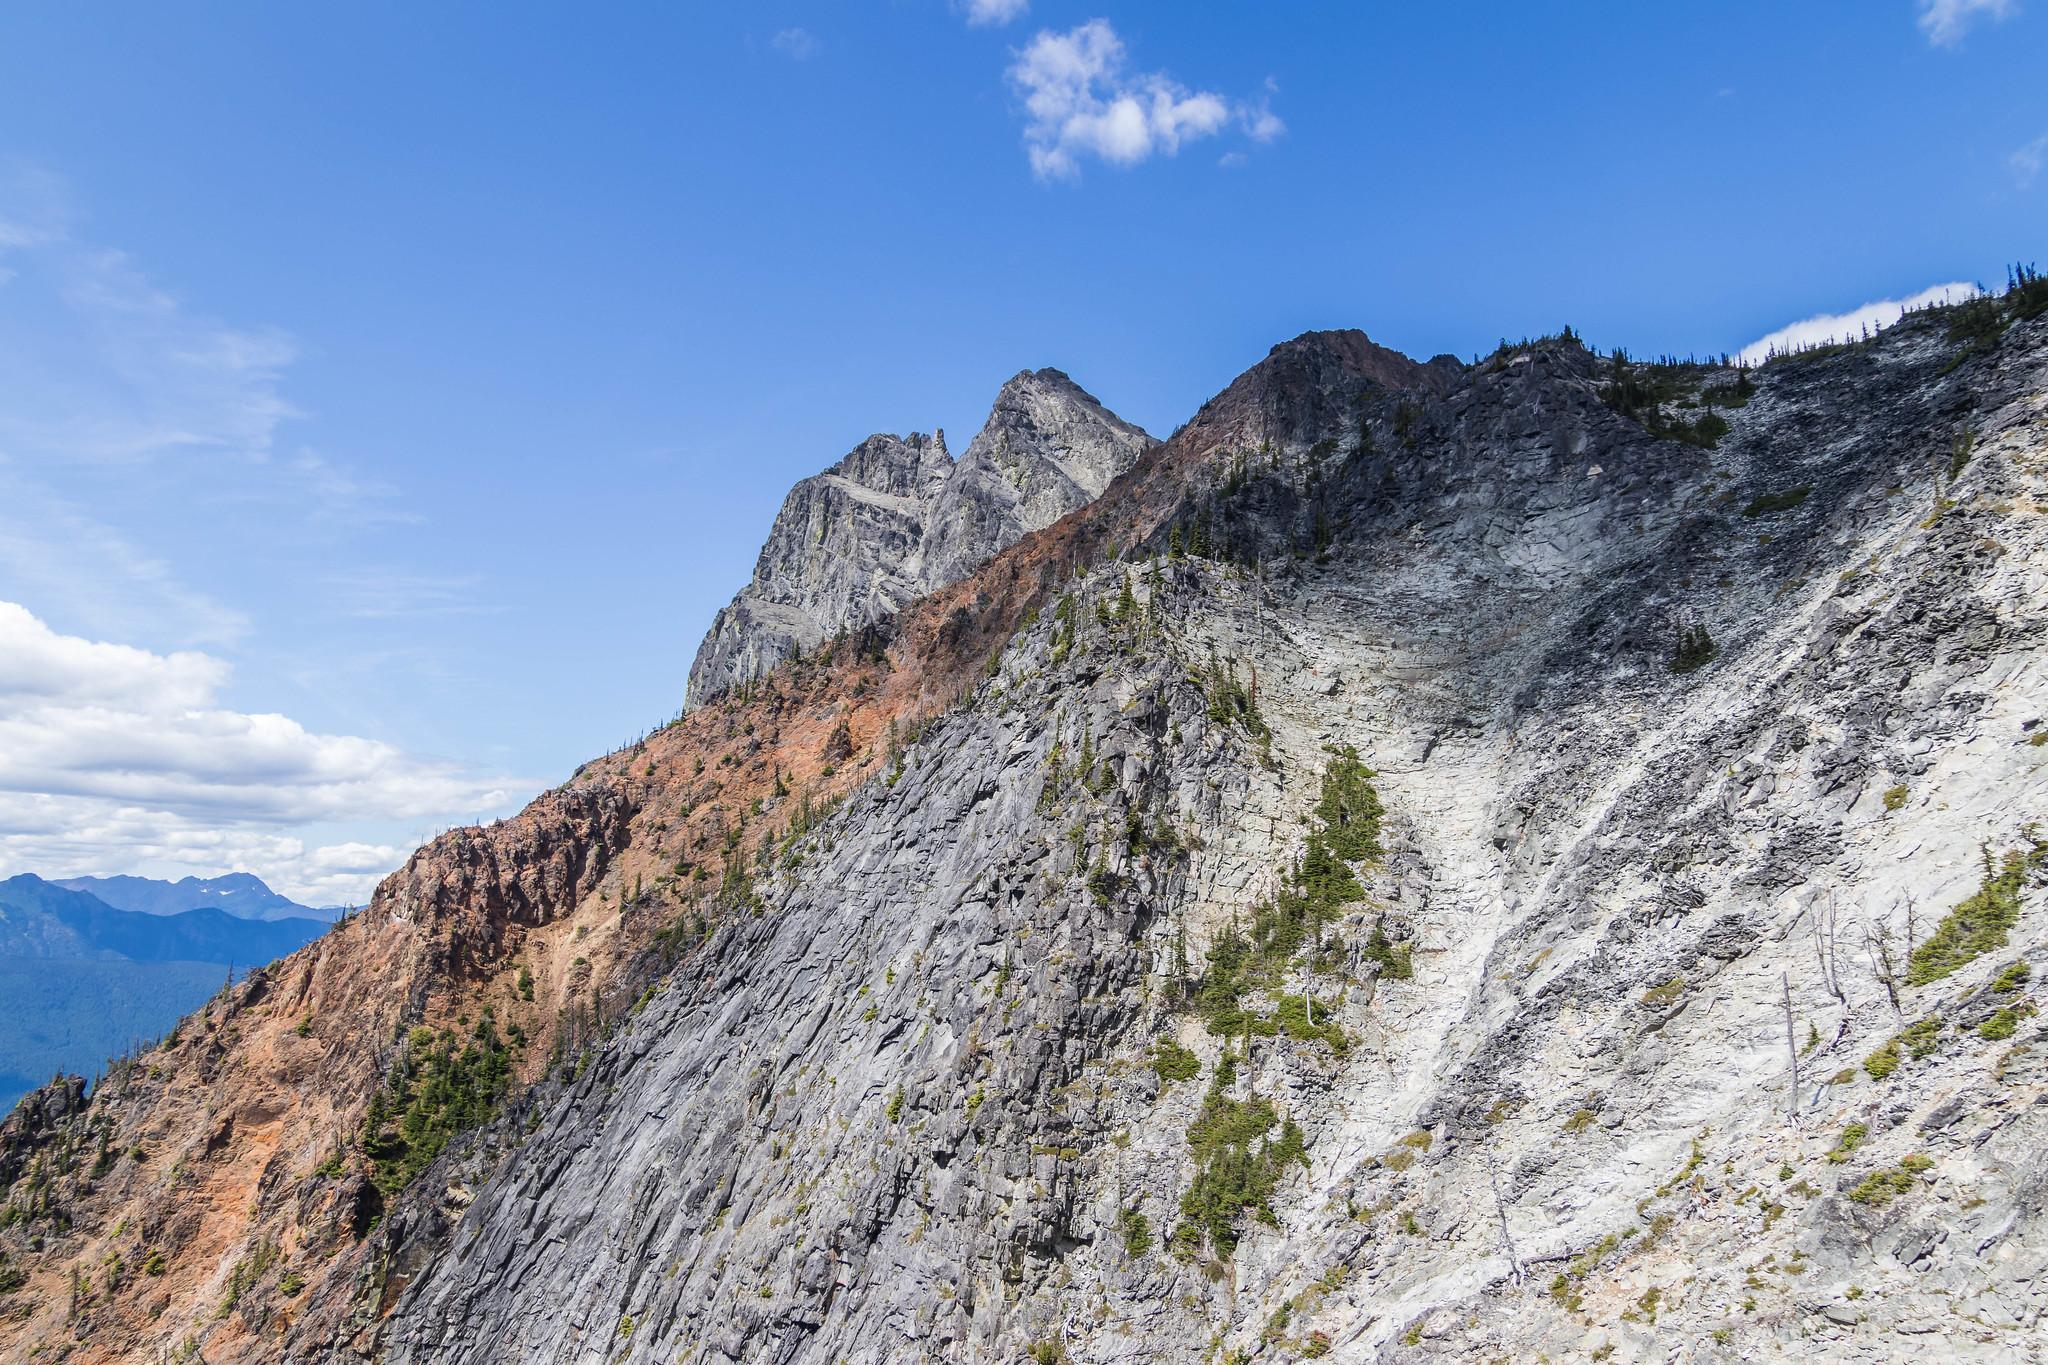 Hozomeen Mountain North Peak making a cameo